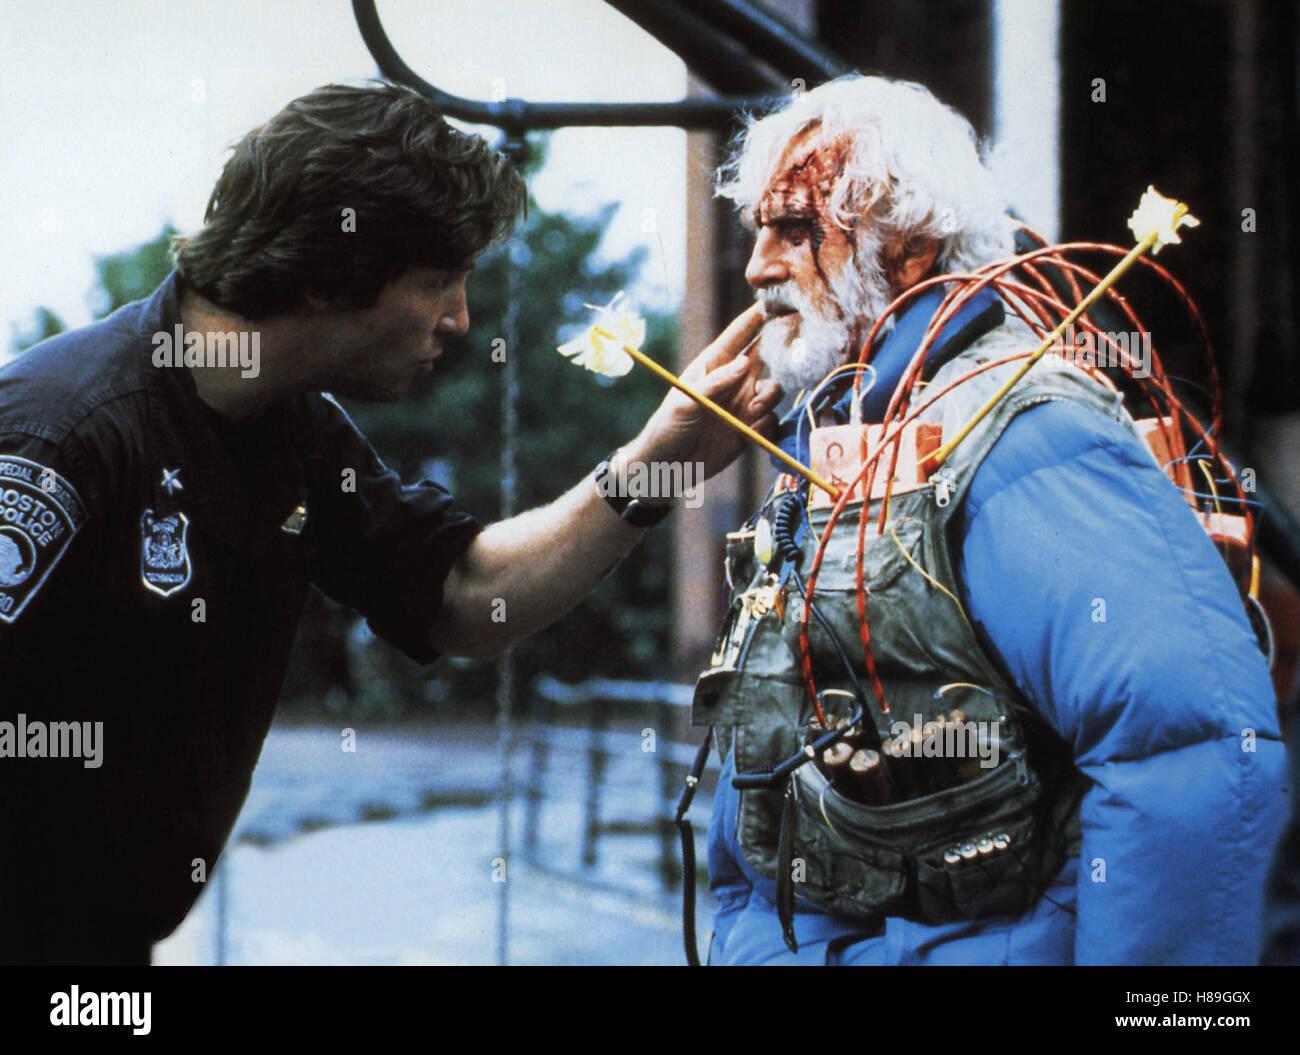 Explosiv - Blown Away, (BLOWN AWAY) USA 1995, Regie: Steohen Hopkins, JEFF BRIDGES, LLOYD BRIDGES, Stichwort: Bombenleger, Stock Photo